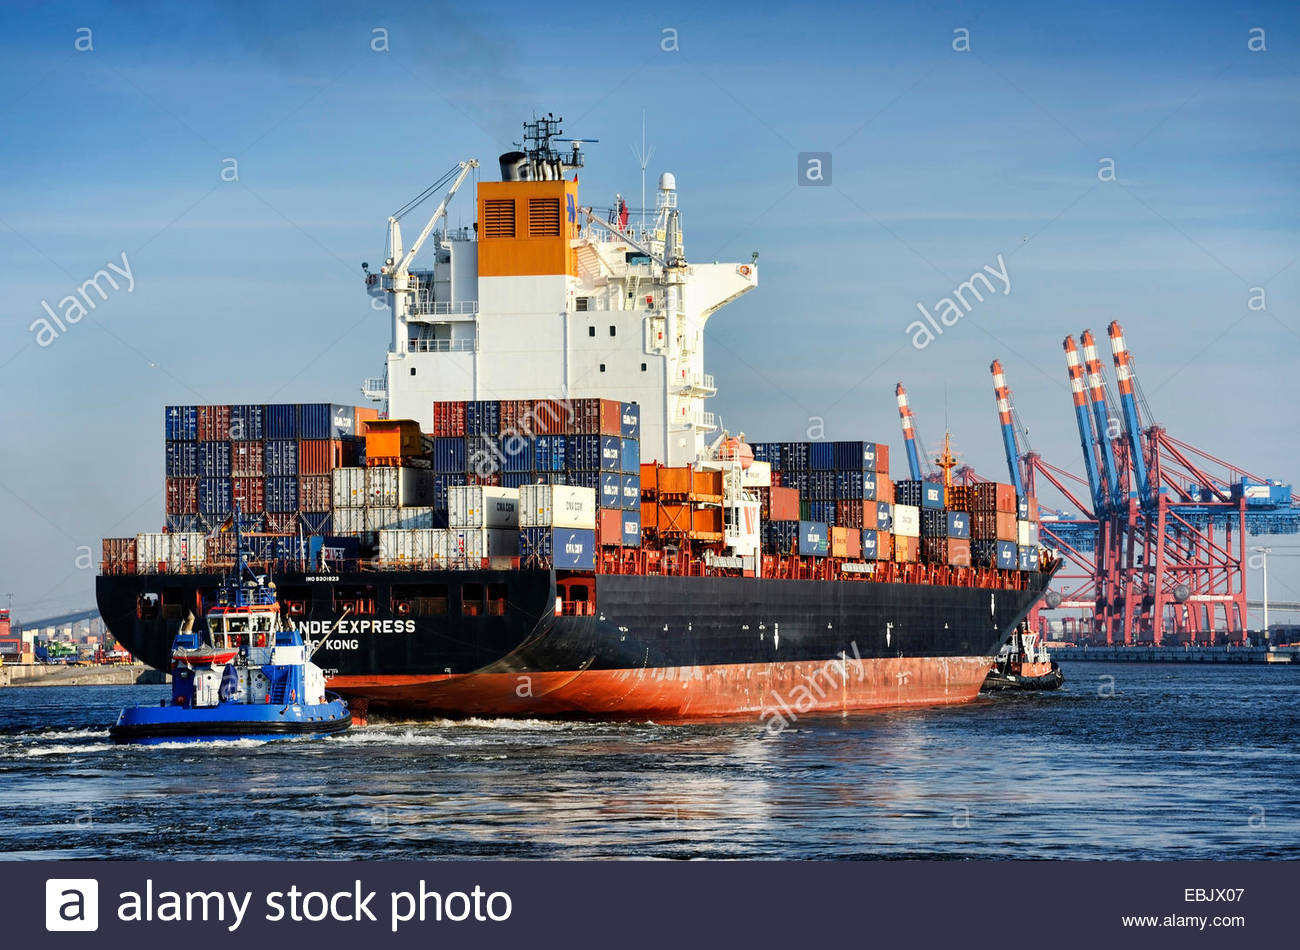 cargo ship Rio Grande Express at the Waltershofer Hafen, Germany, Hamburg Stock Photo